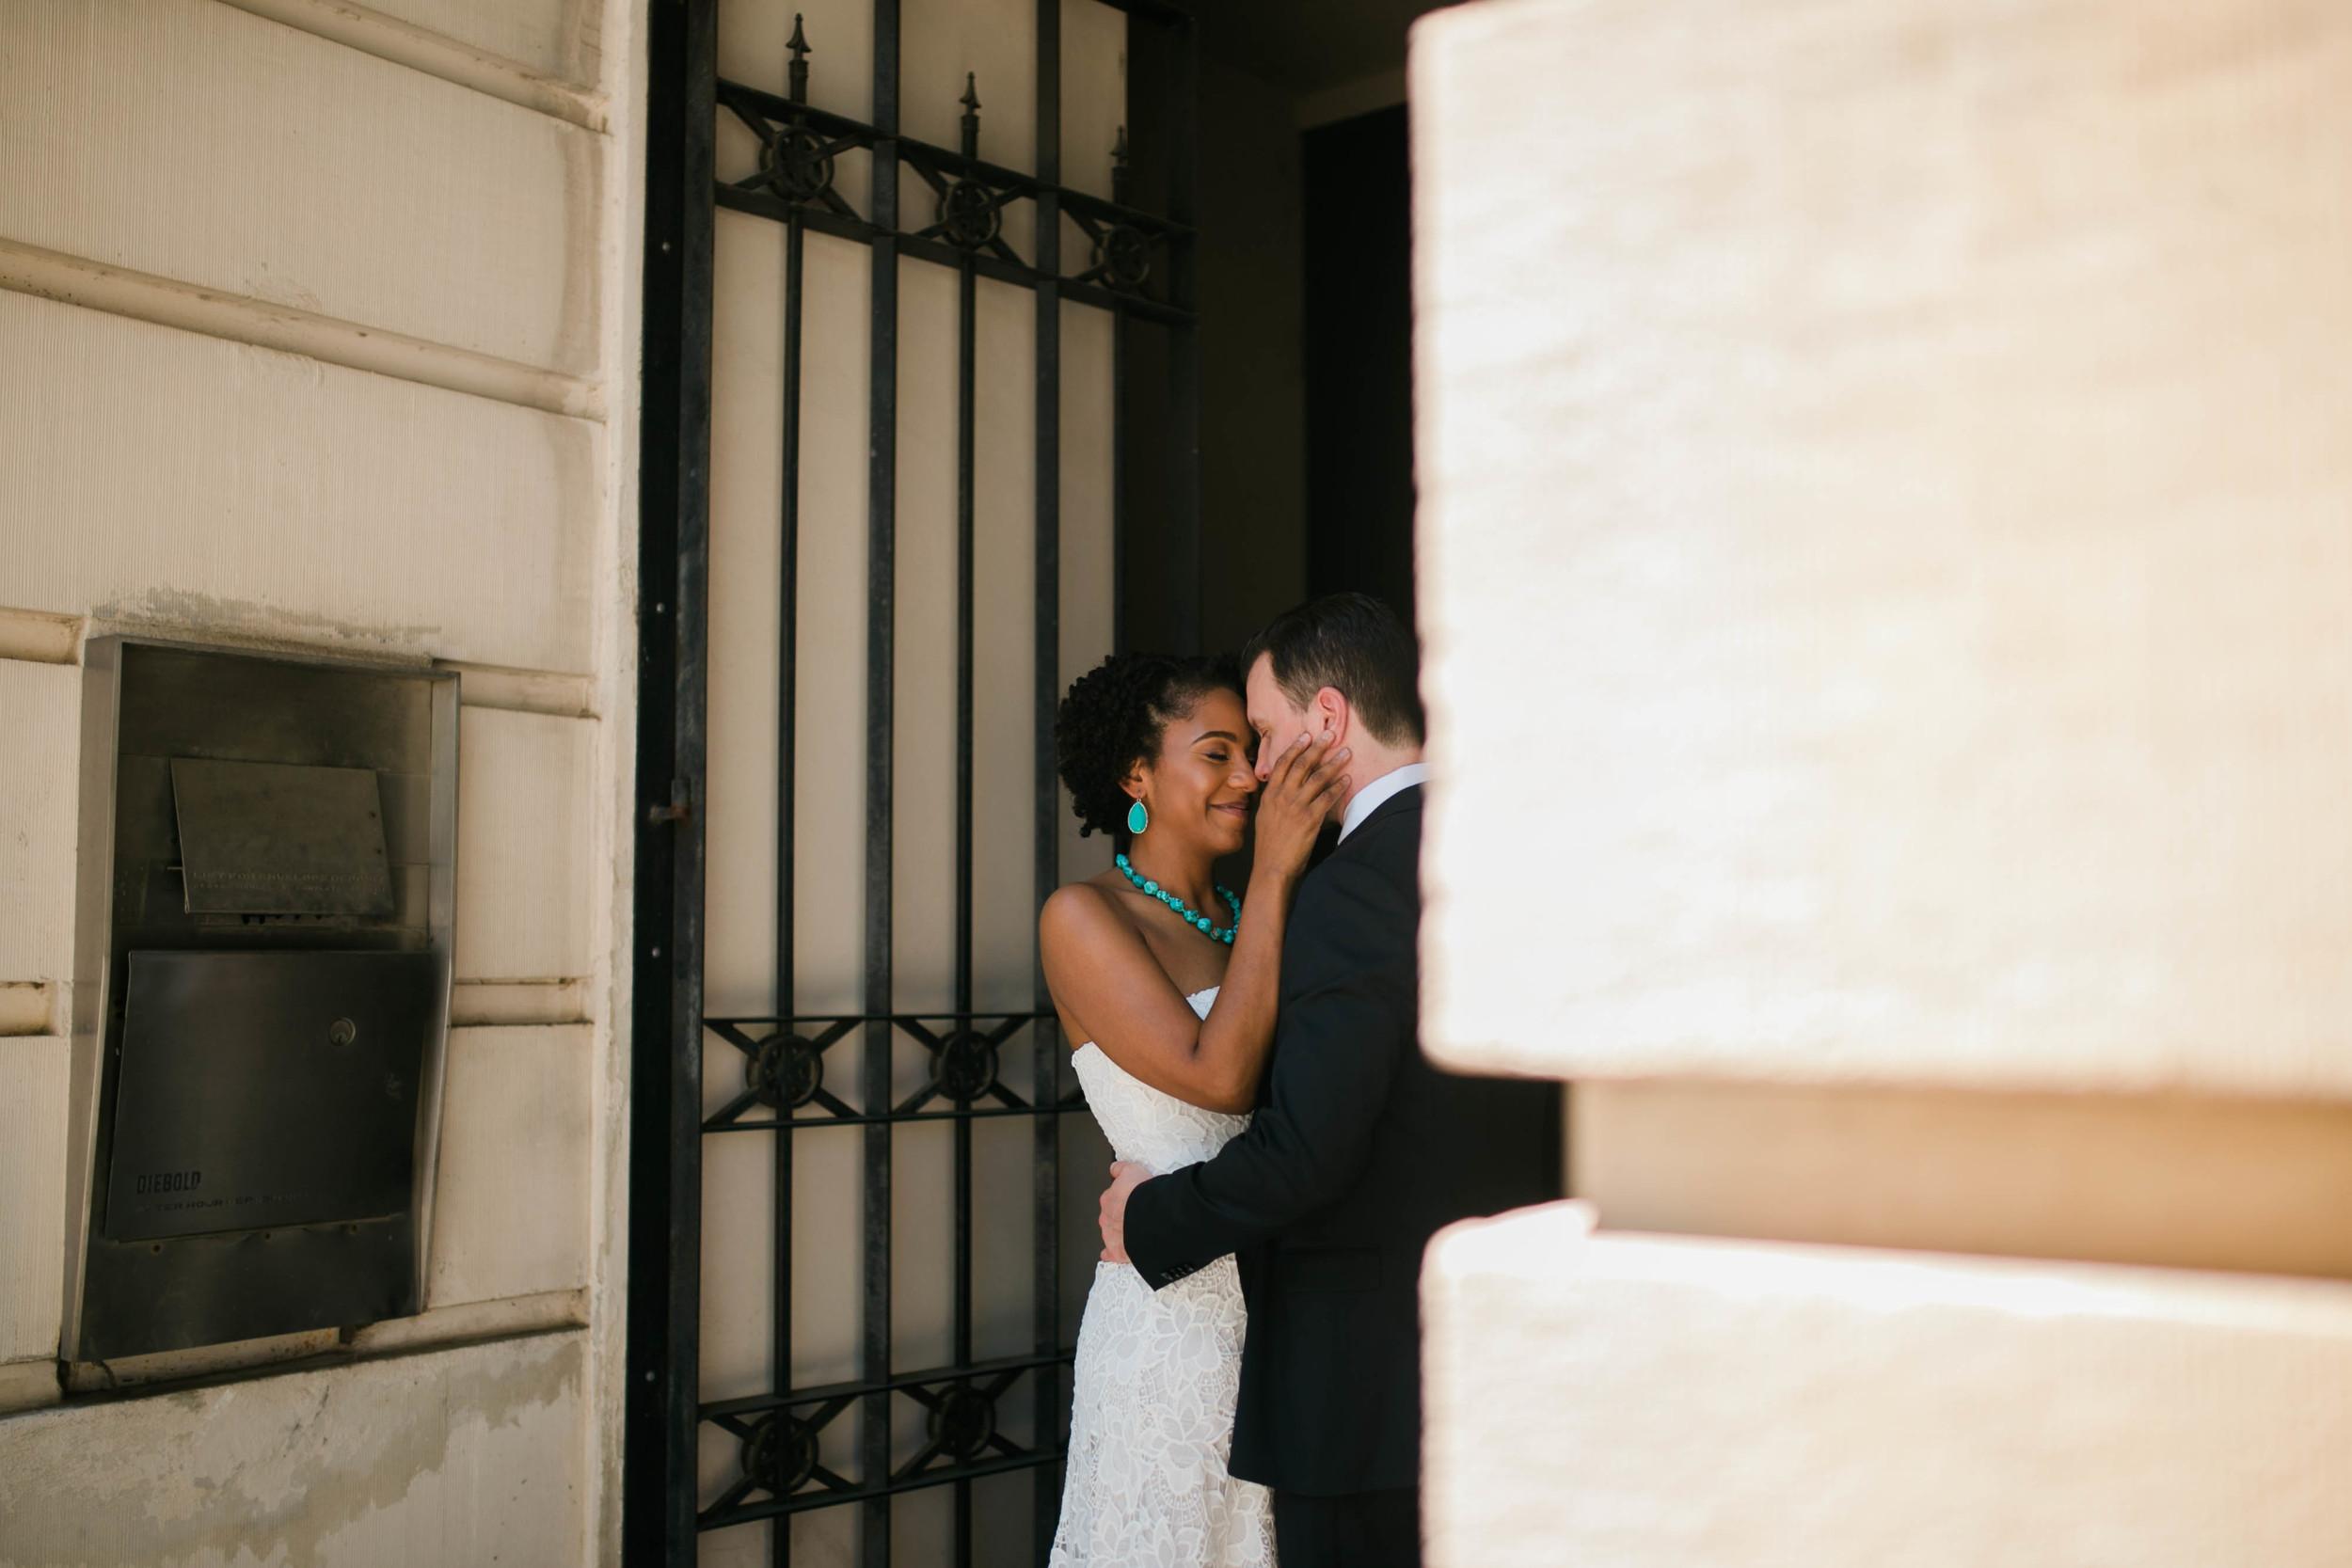 Dekalb-County-Courthouse-Wedding-Photos-Kiyah-C-Photography-61.jpg